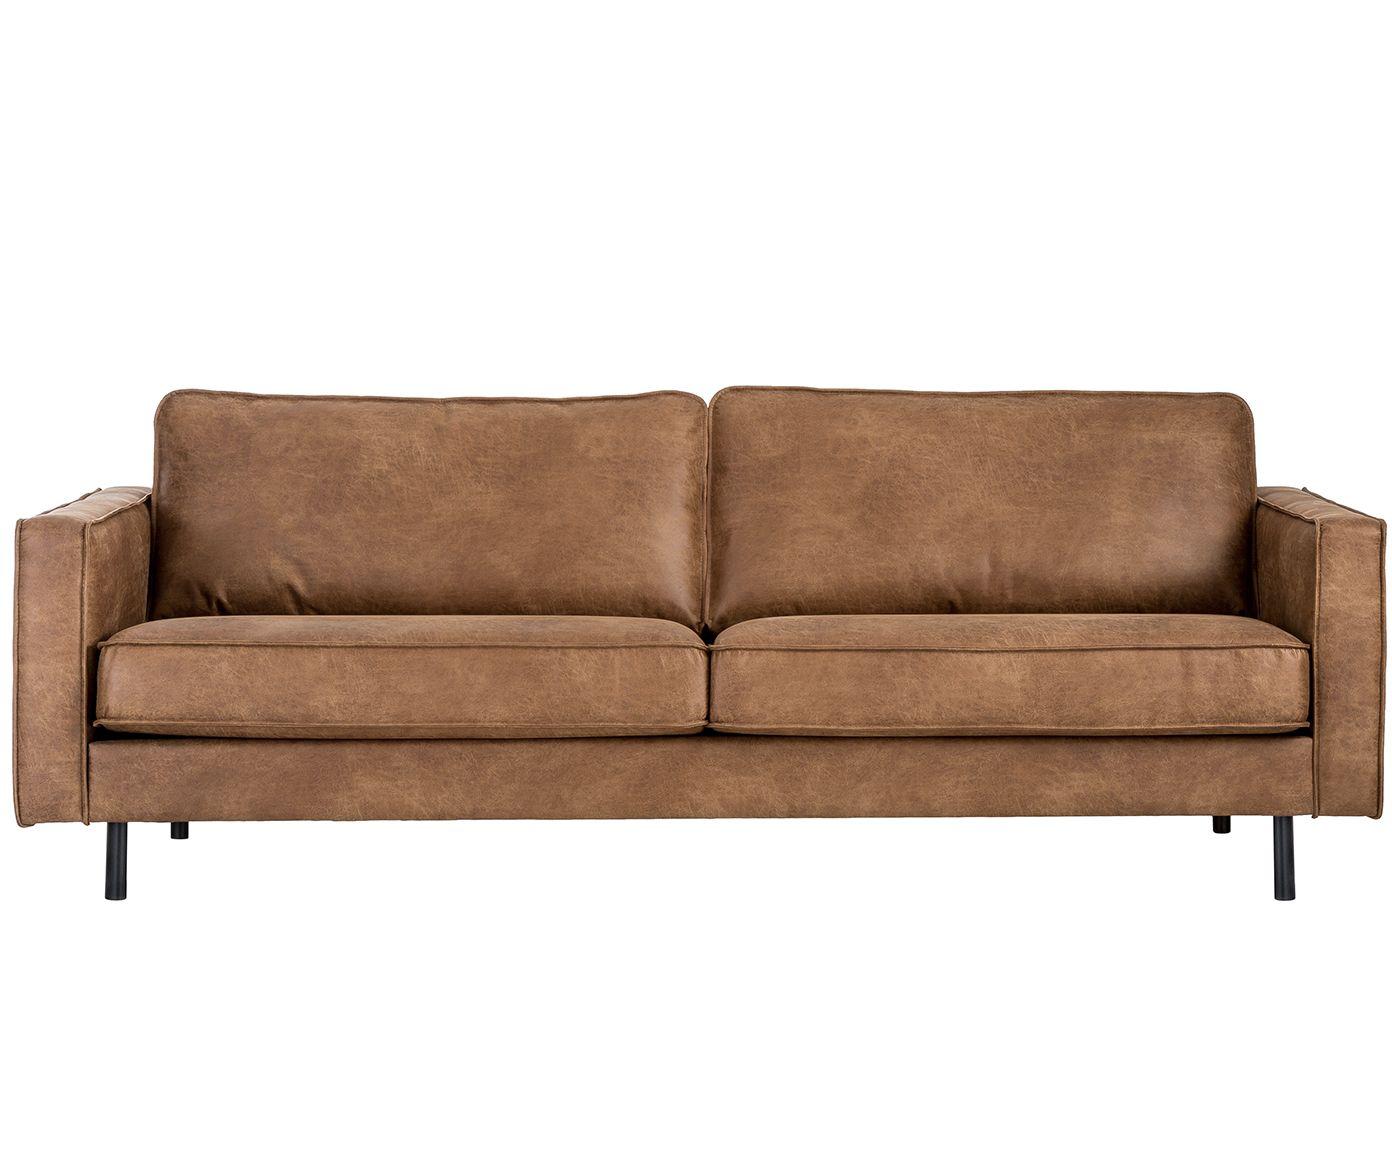 Sofa Hunter 3 Sitzer In Braun Aus Recyceltem Leder Westwingnow Leder Wohnzimmer Sofa Leder